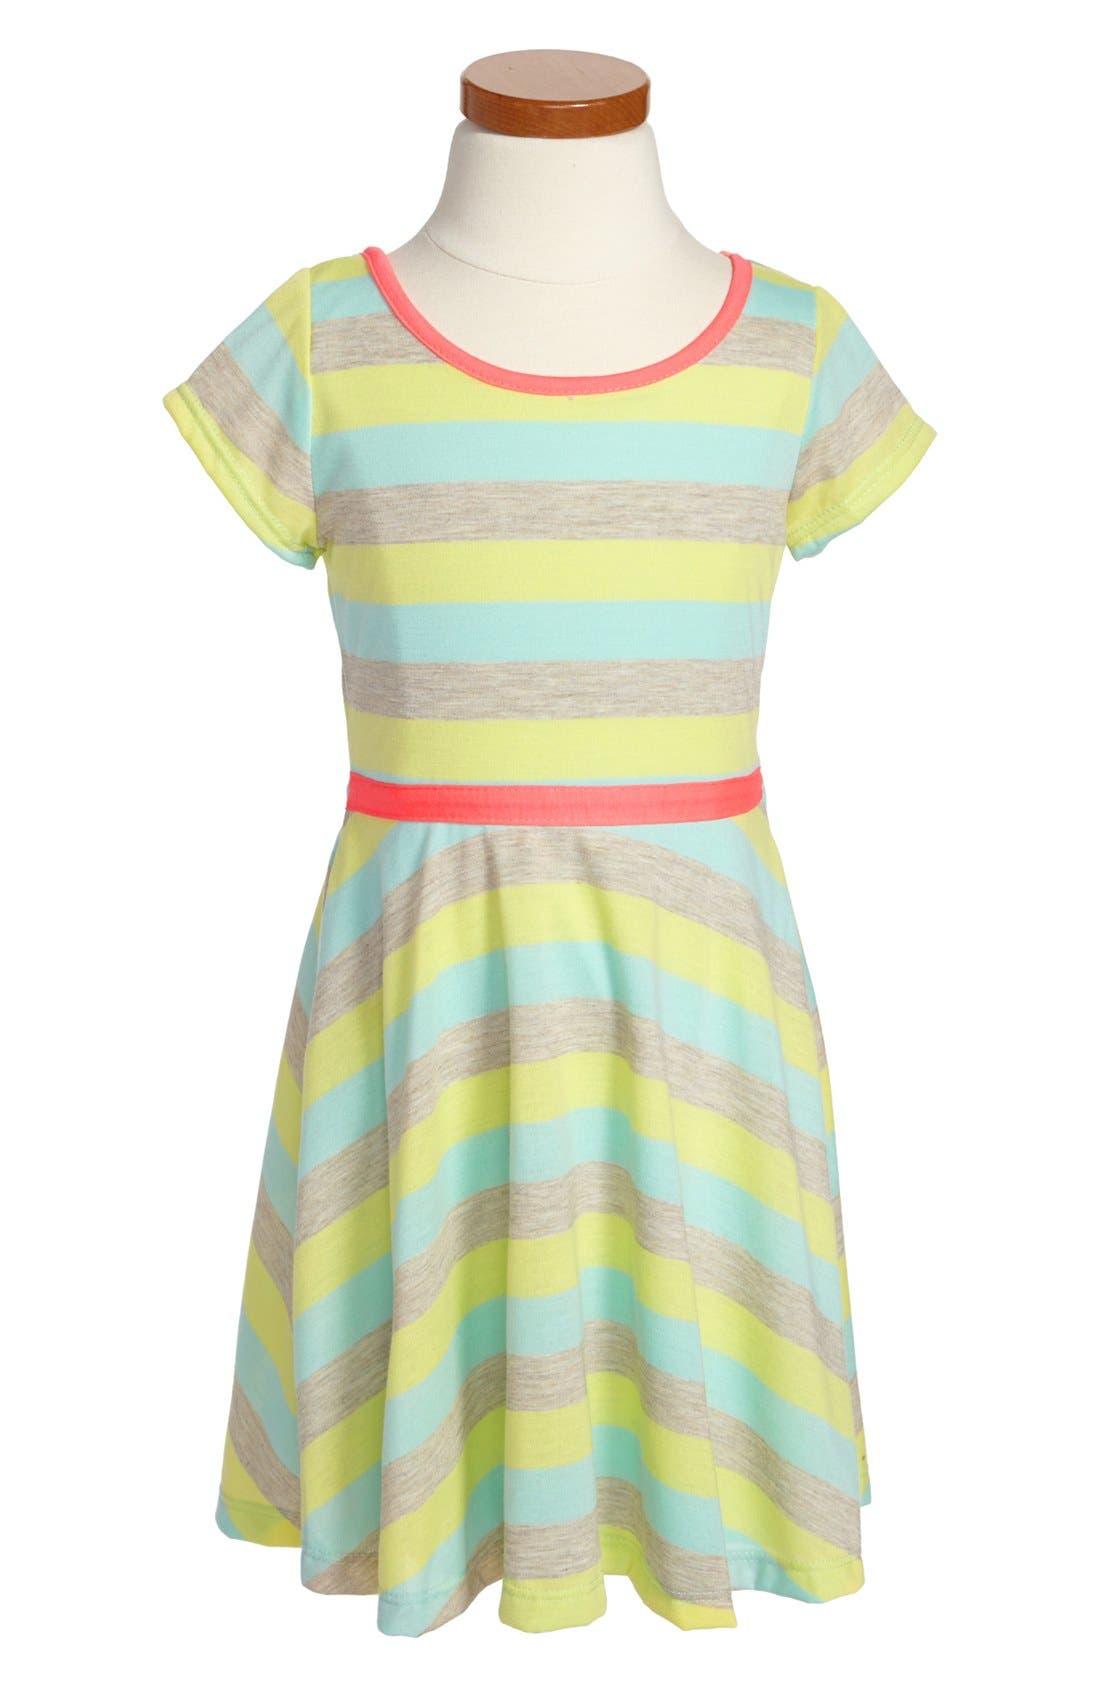 Main Image - Zunie Stripe Skater Dress (Little Girls & Big Girls)